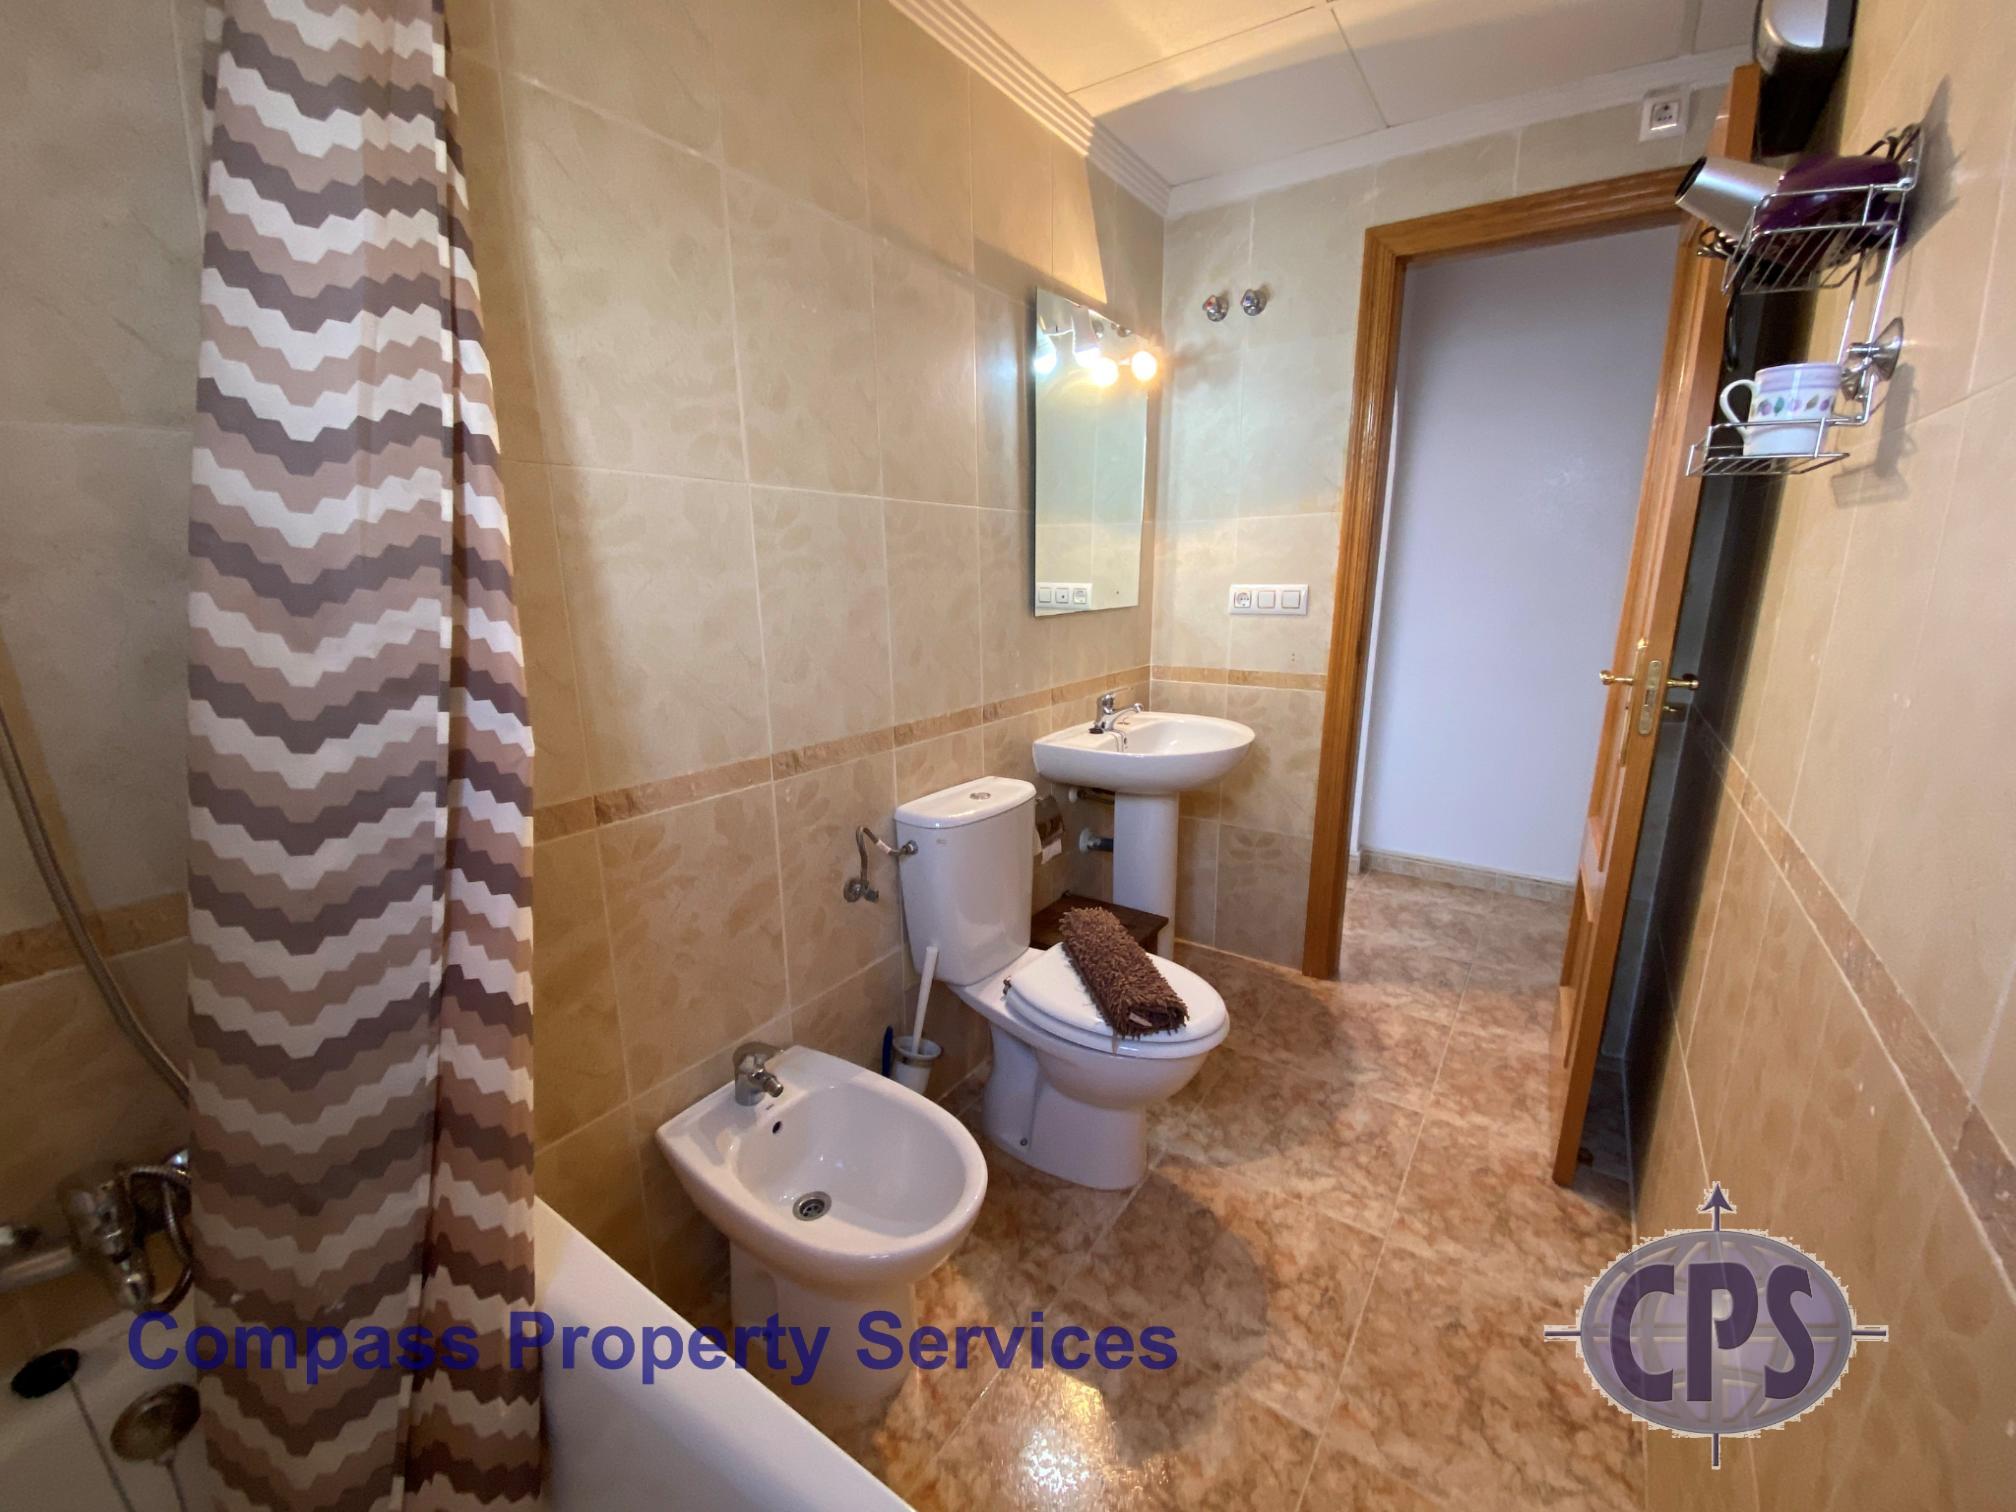 Apartment La Cinuelica R3 1st flr apt overlooking pool l149 photo 28556787